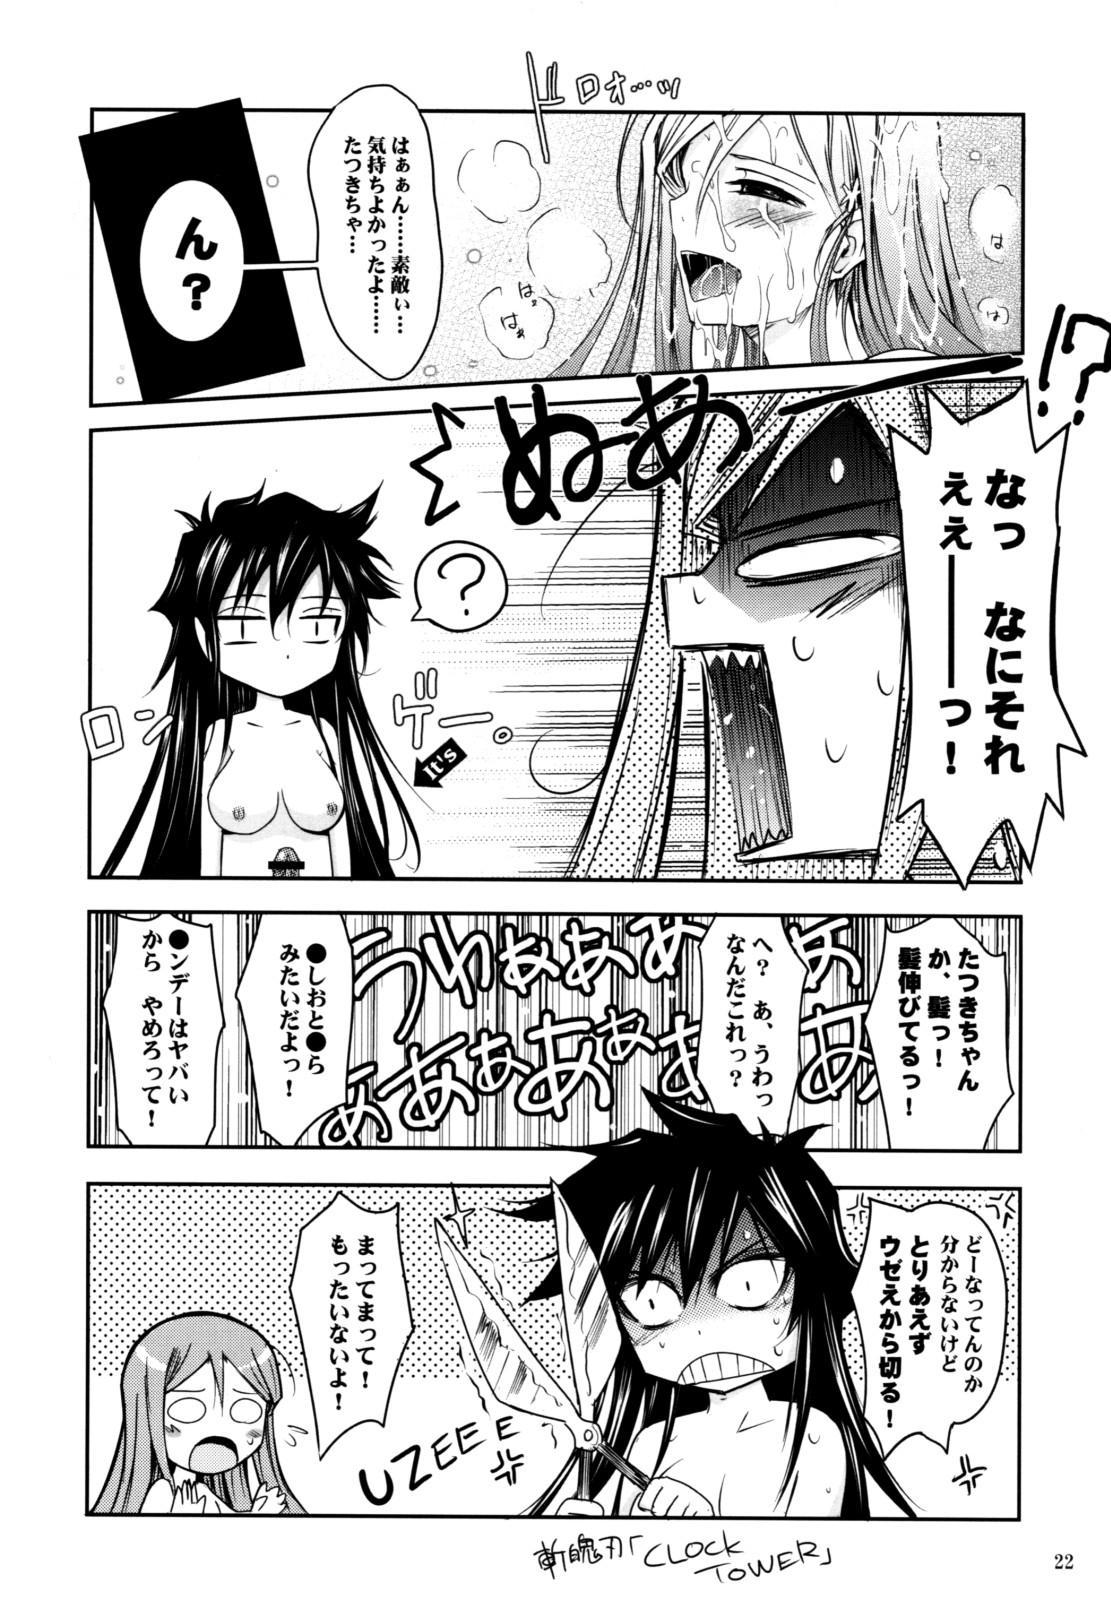 (C74) [Garyuh-Chitai (TANA)] Aki-Akane -ANOTHER DAY- (Bleach) 20